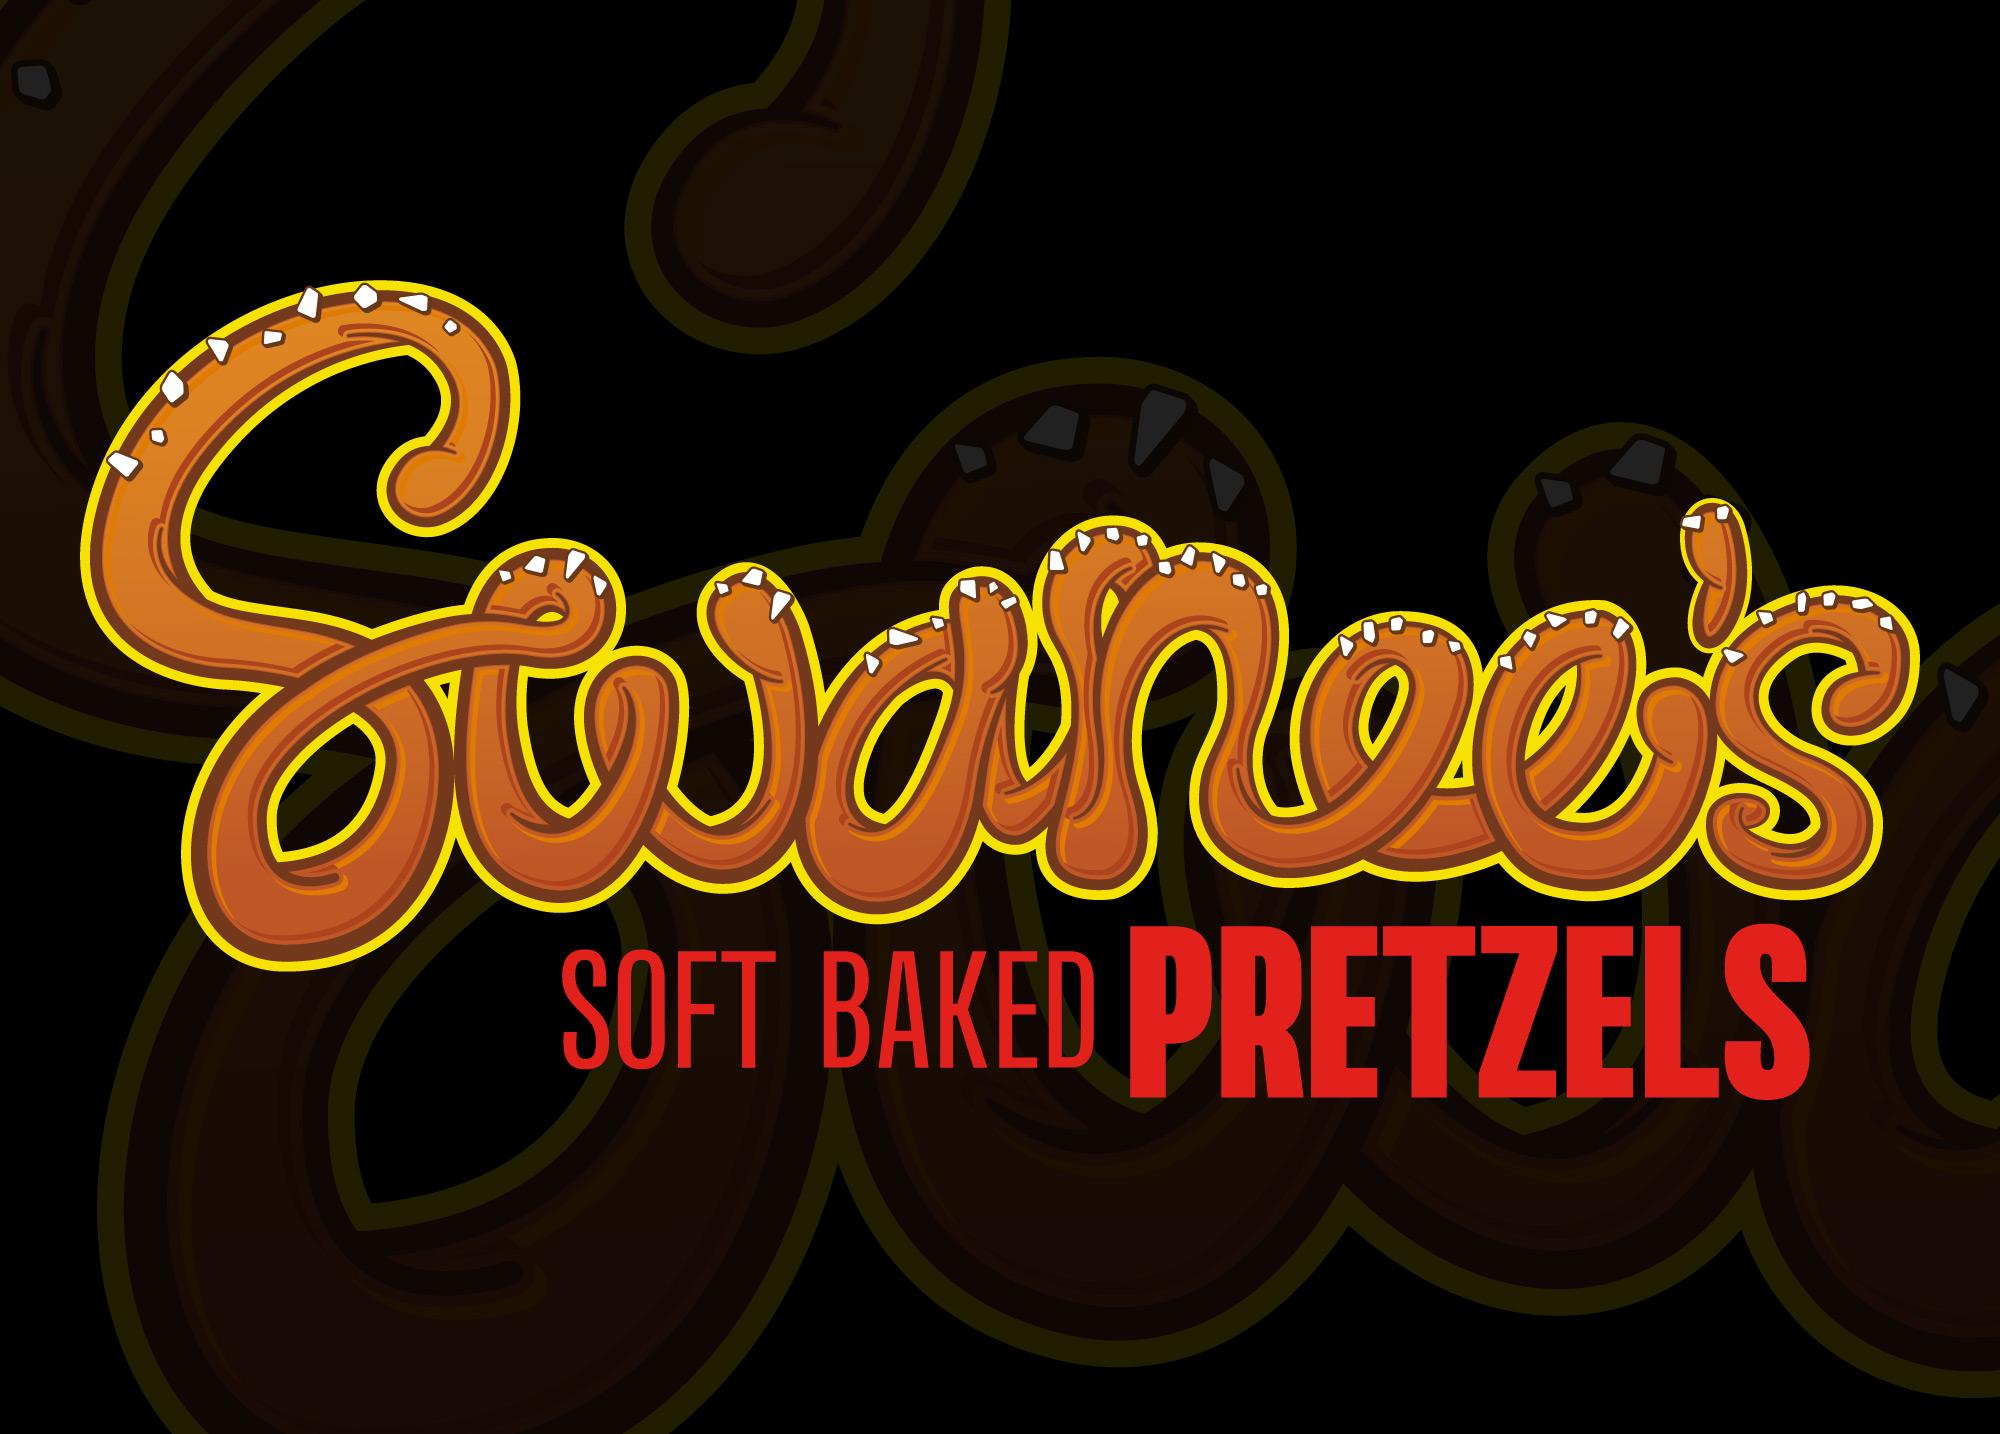 Swanee's Soft Baked Pretzels